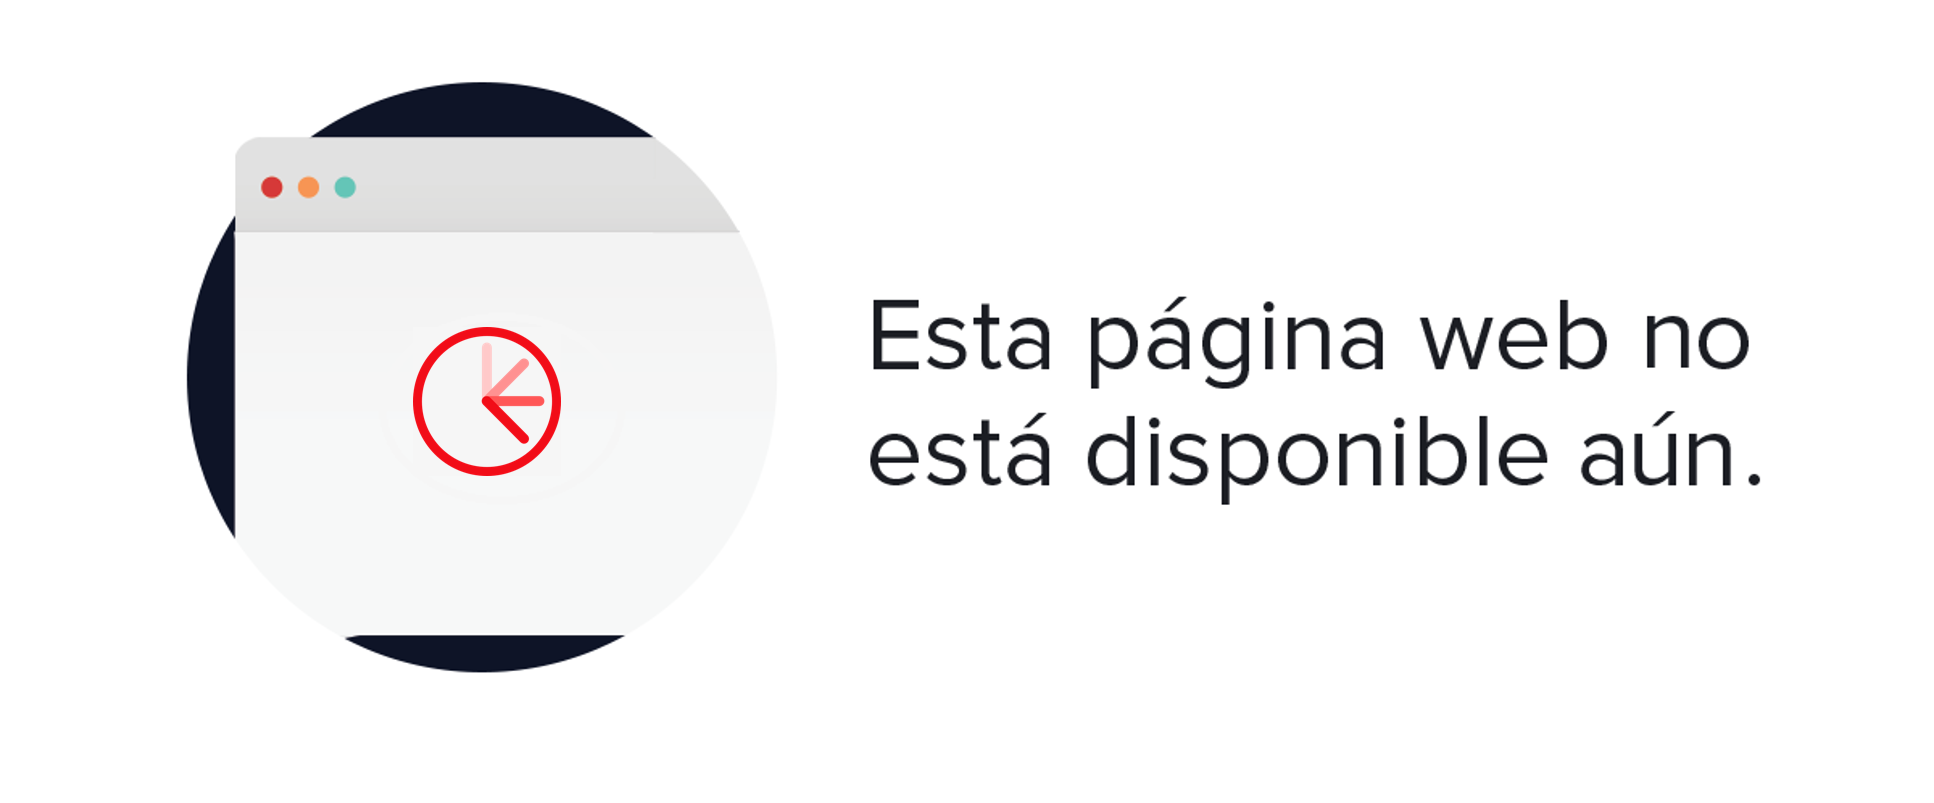 OXXO - Pantalón de mujer OXXO pitillo y tobillero Negro 8681613248373 - UMYSYXV